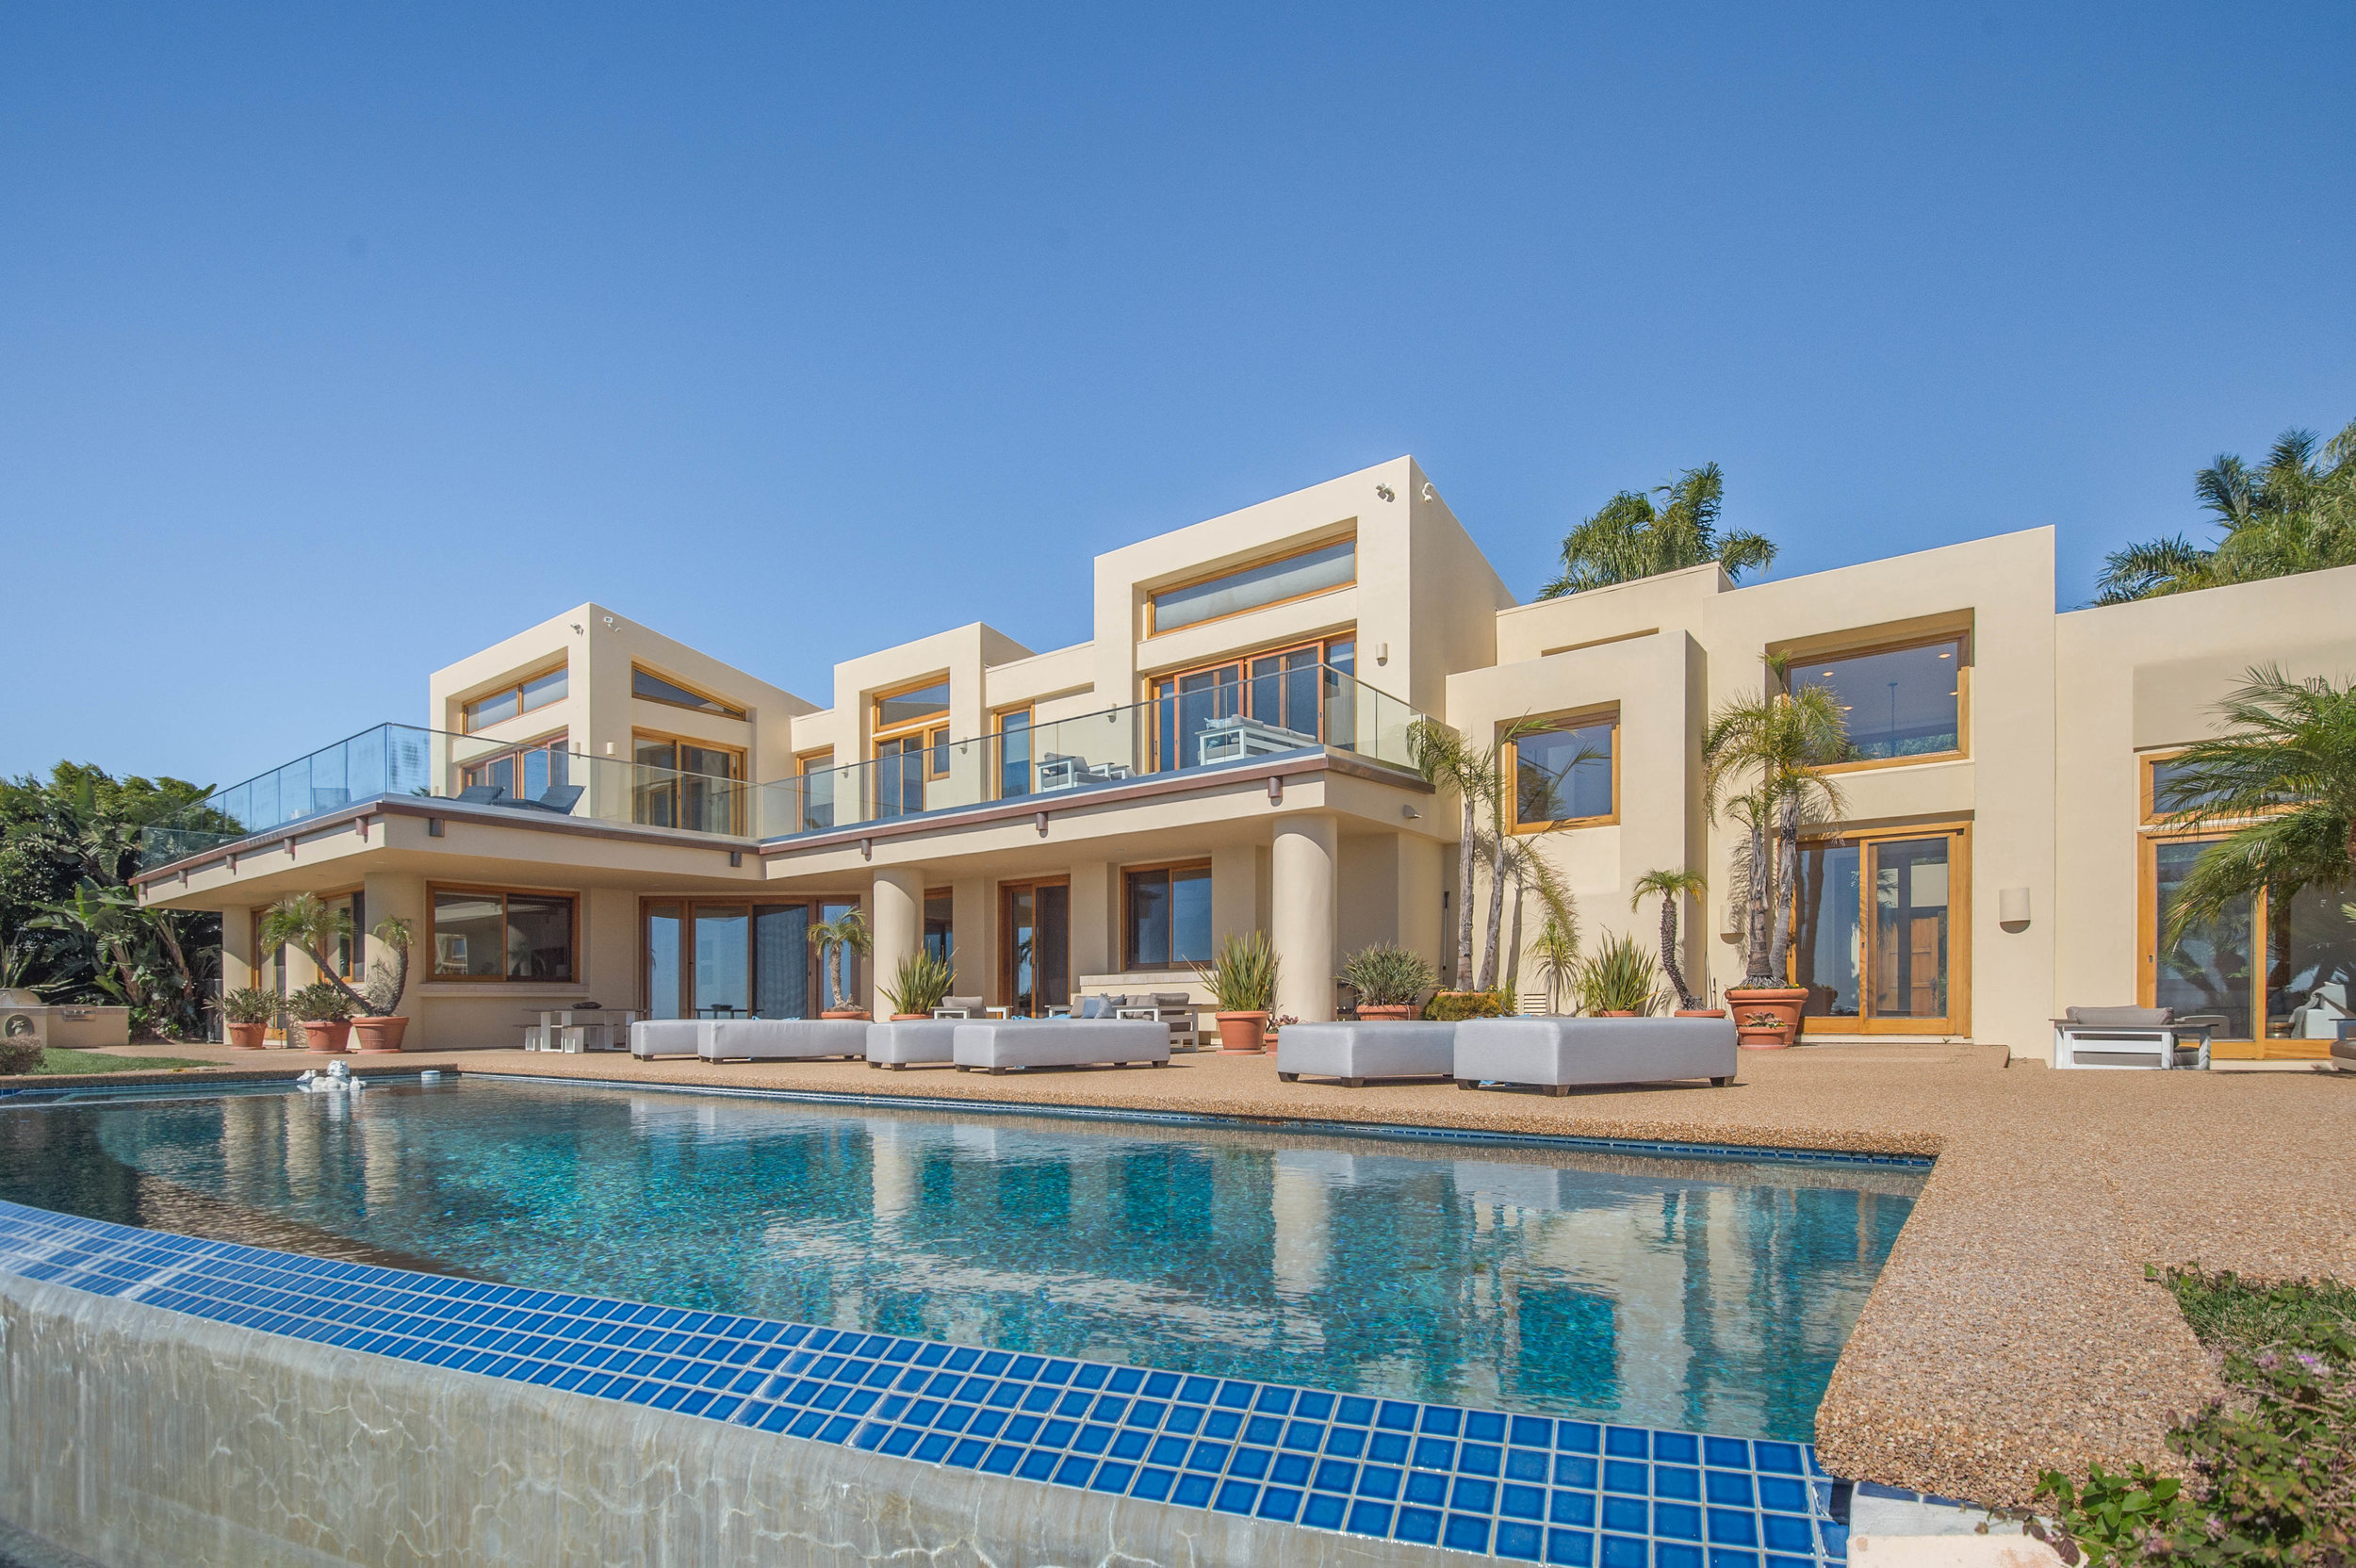 003 Pool House 27475 Latigo Bay View Drive For Sale Lease The Malibu Life Team Luxury Real Estate.jpg